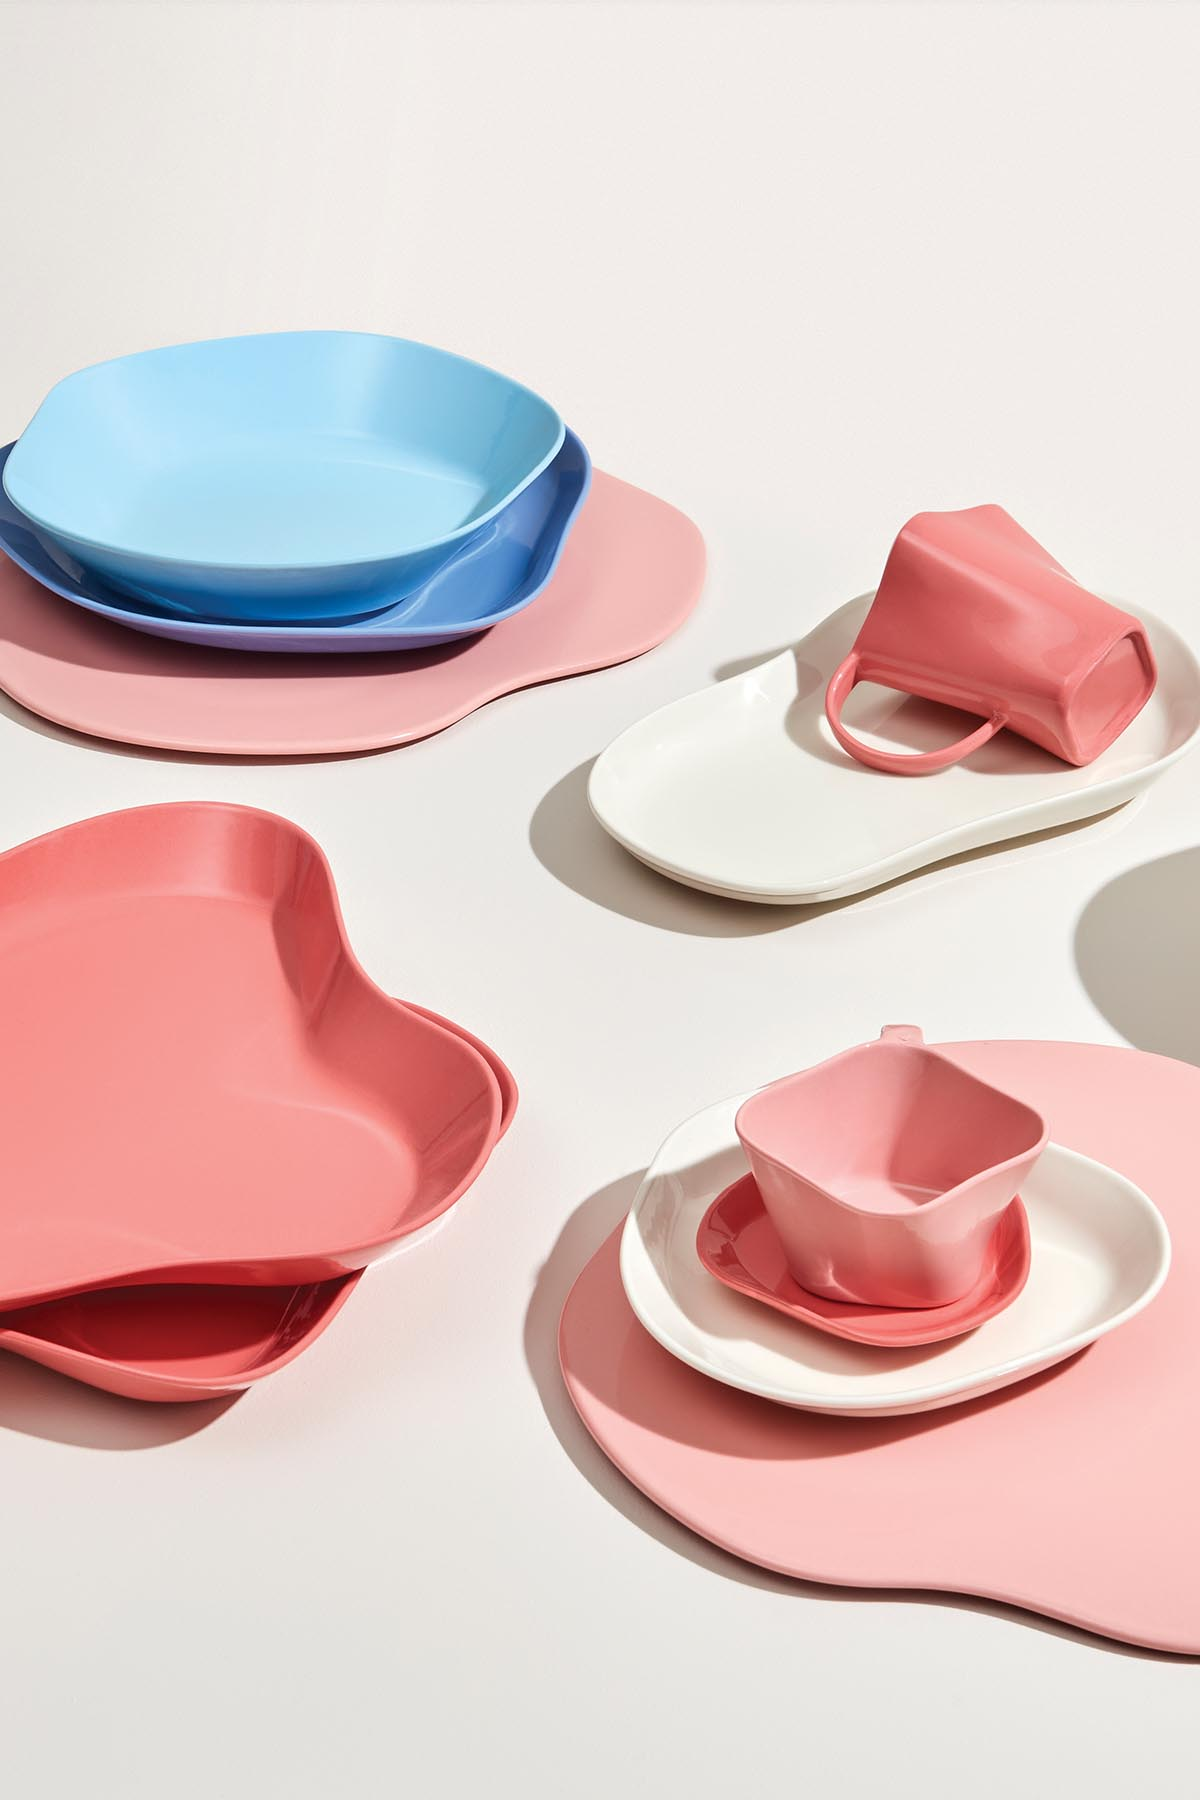 Kütahya Porselen Skallop 2′li 28x25 cm Kayık Seti Pembe